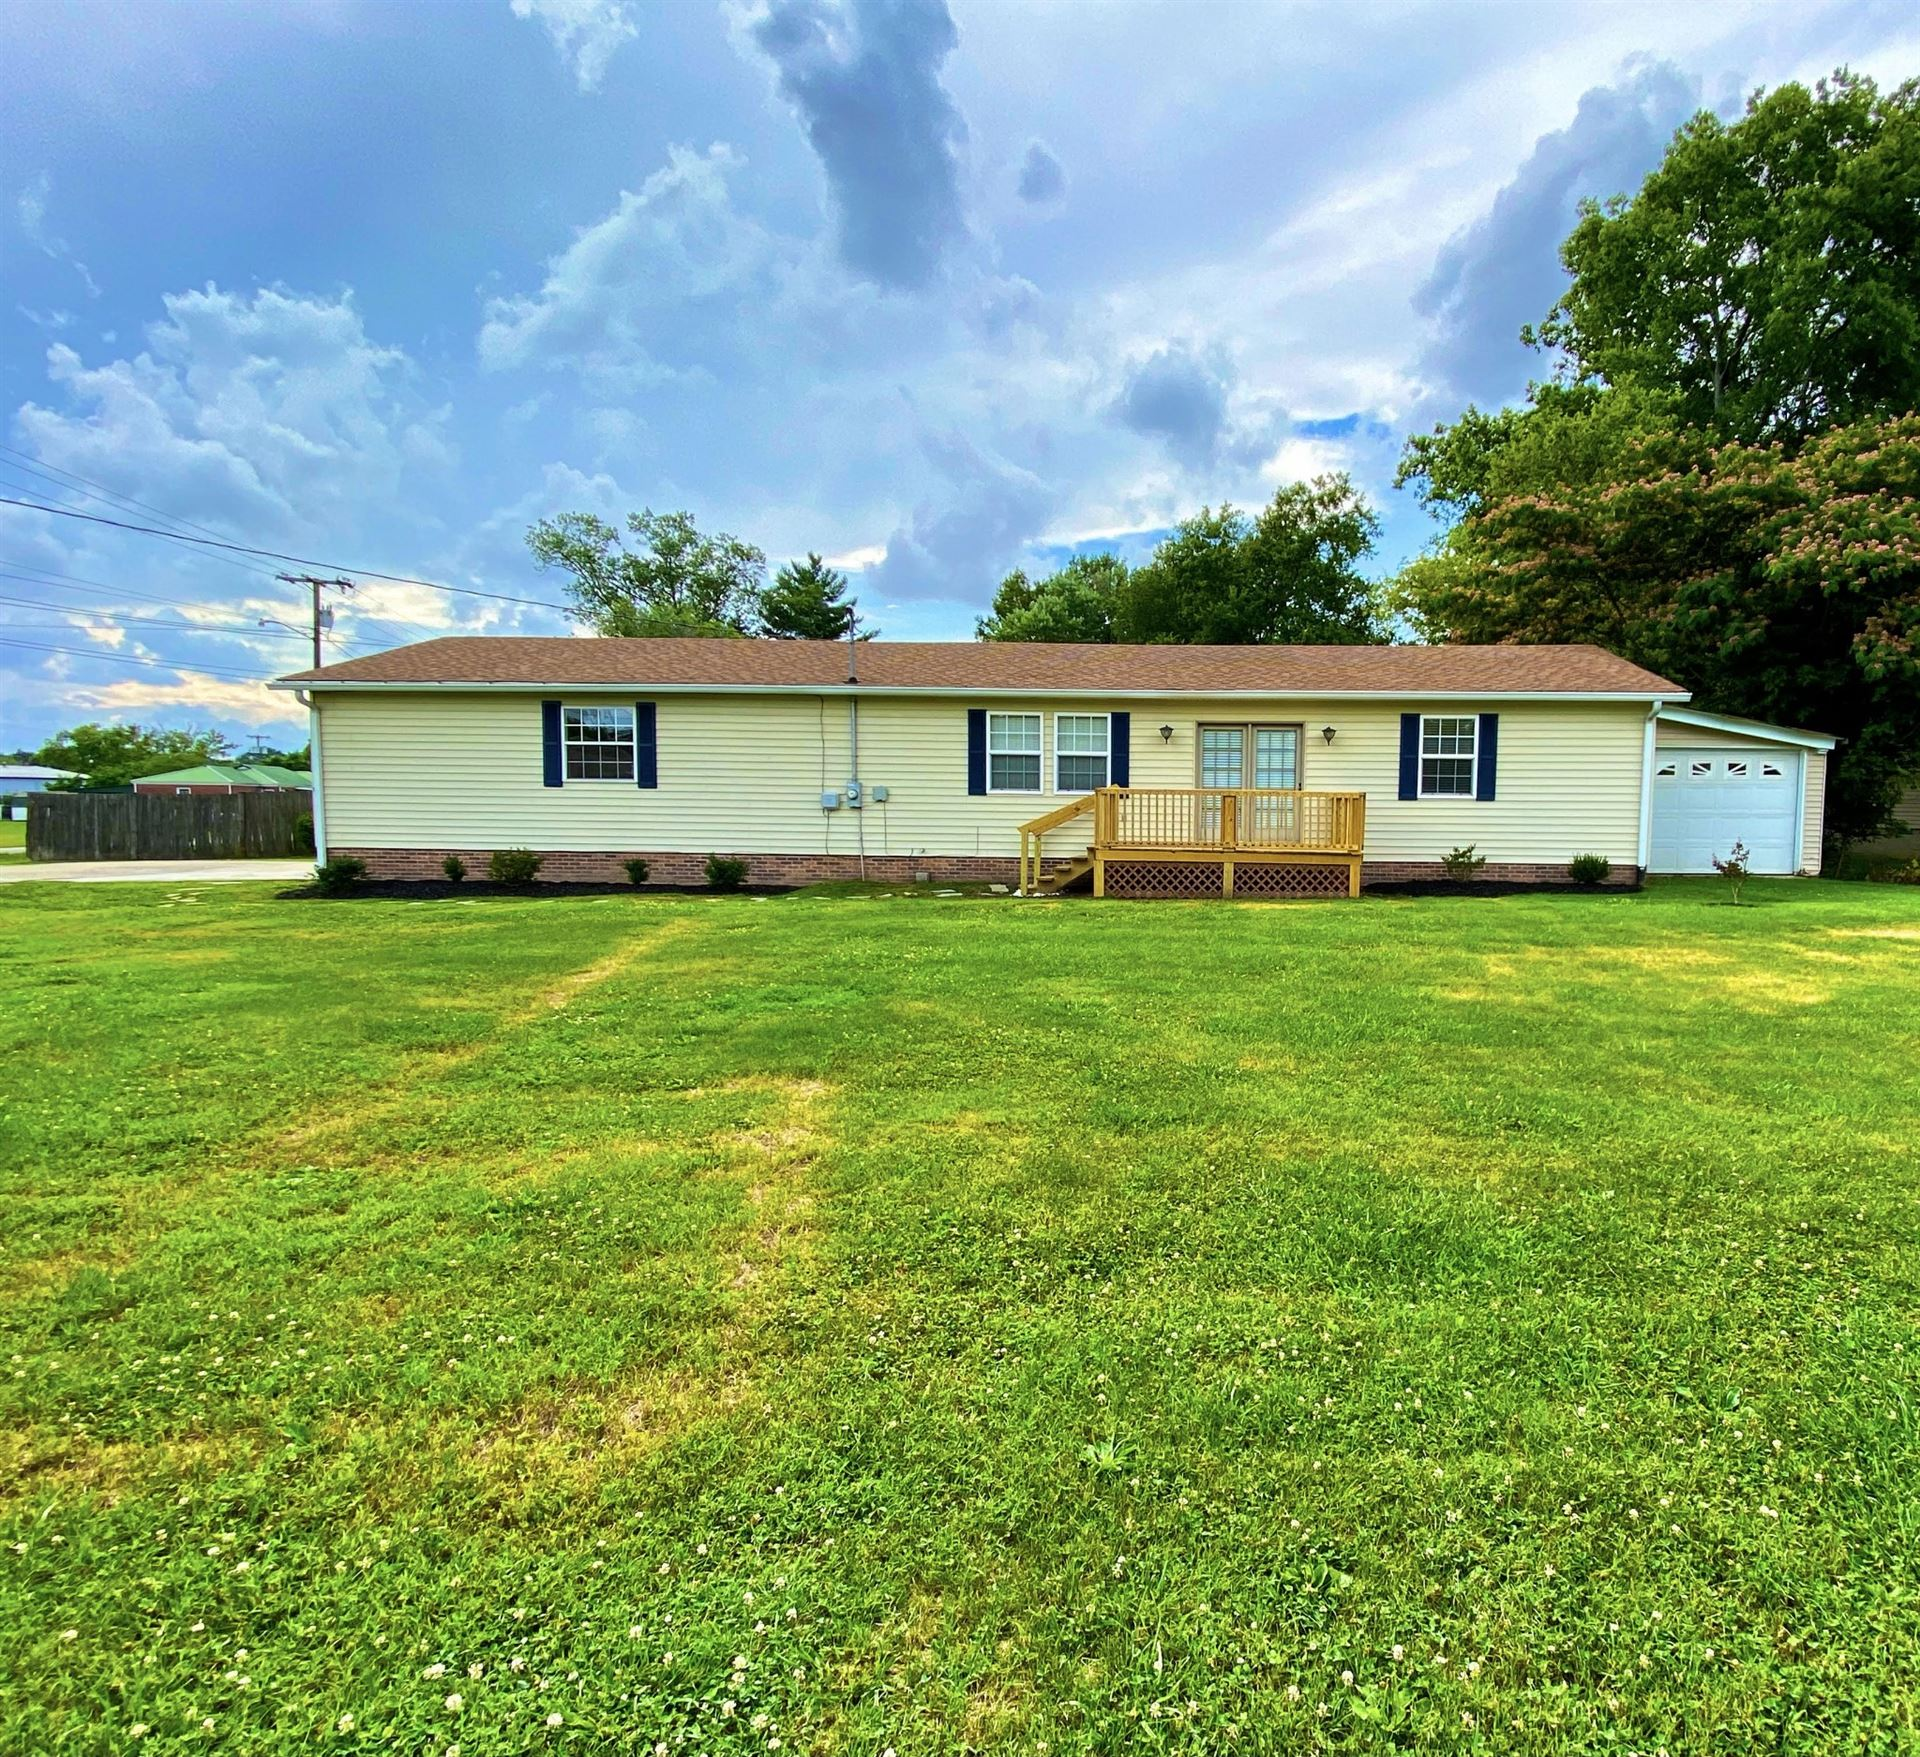 439 Joann St, Gallatin, TN 37066 - MLS#: 2270963